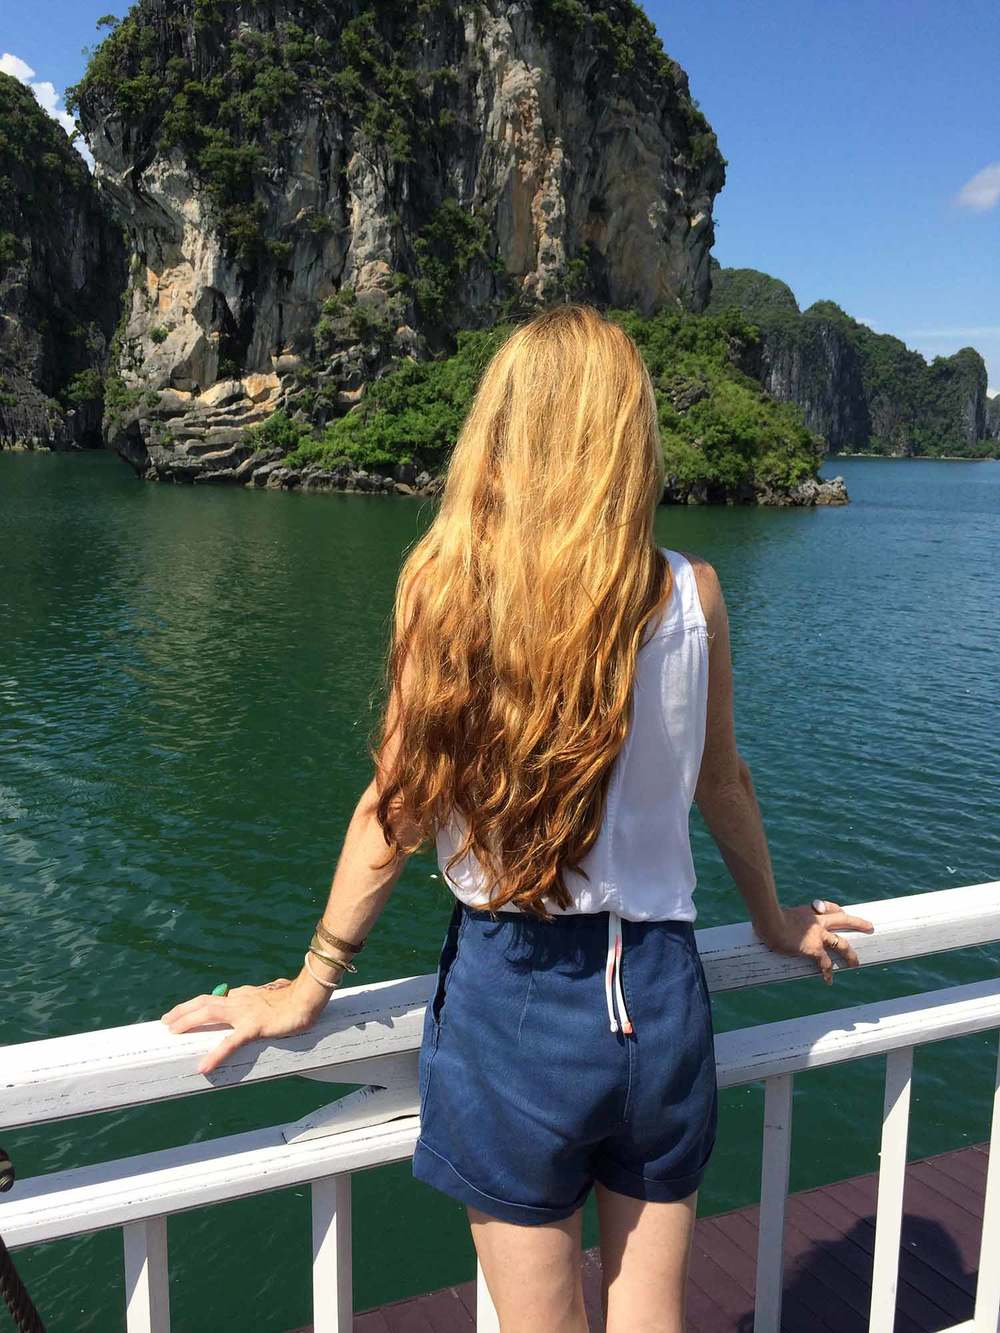 boat_OPT.jpg